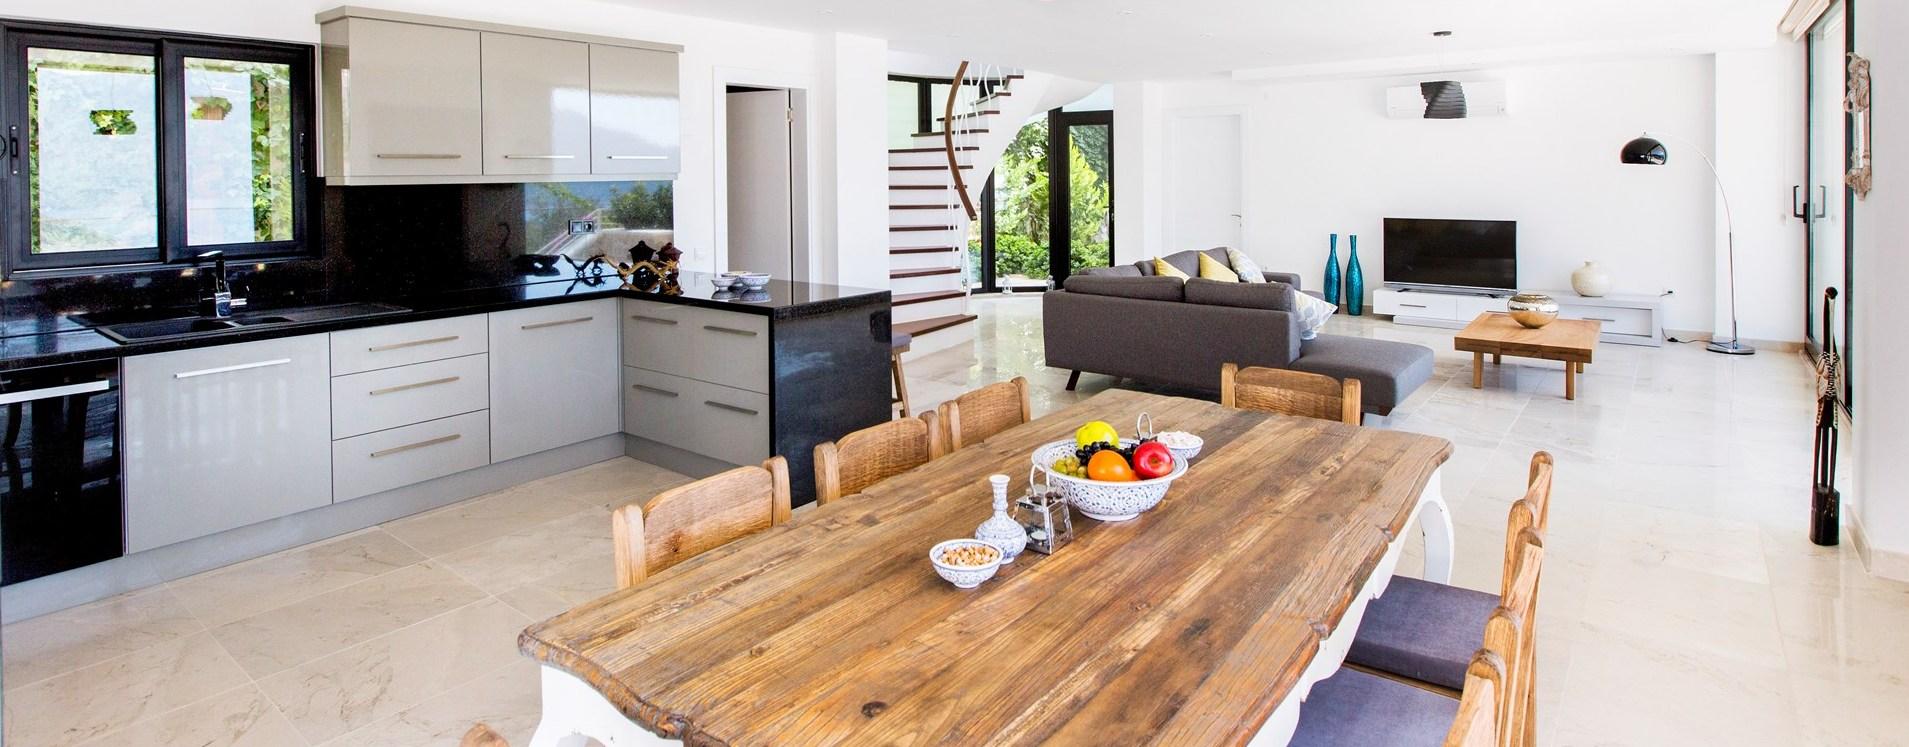 villa-kalamar-open-plan-living-space